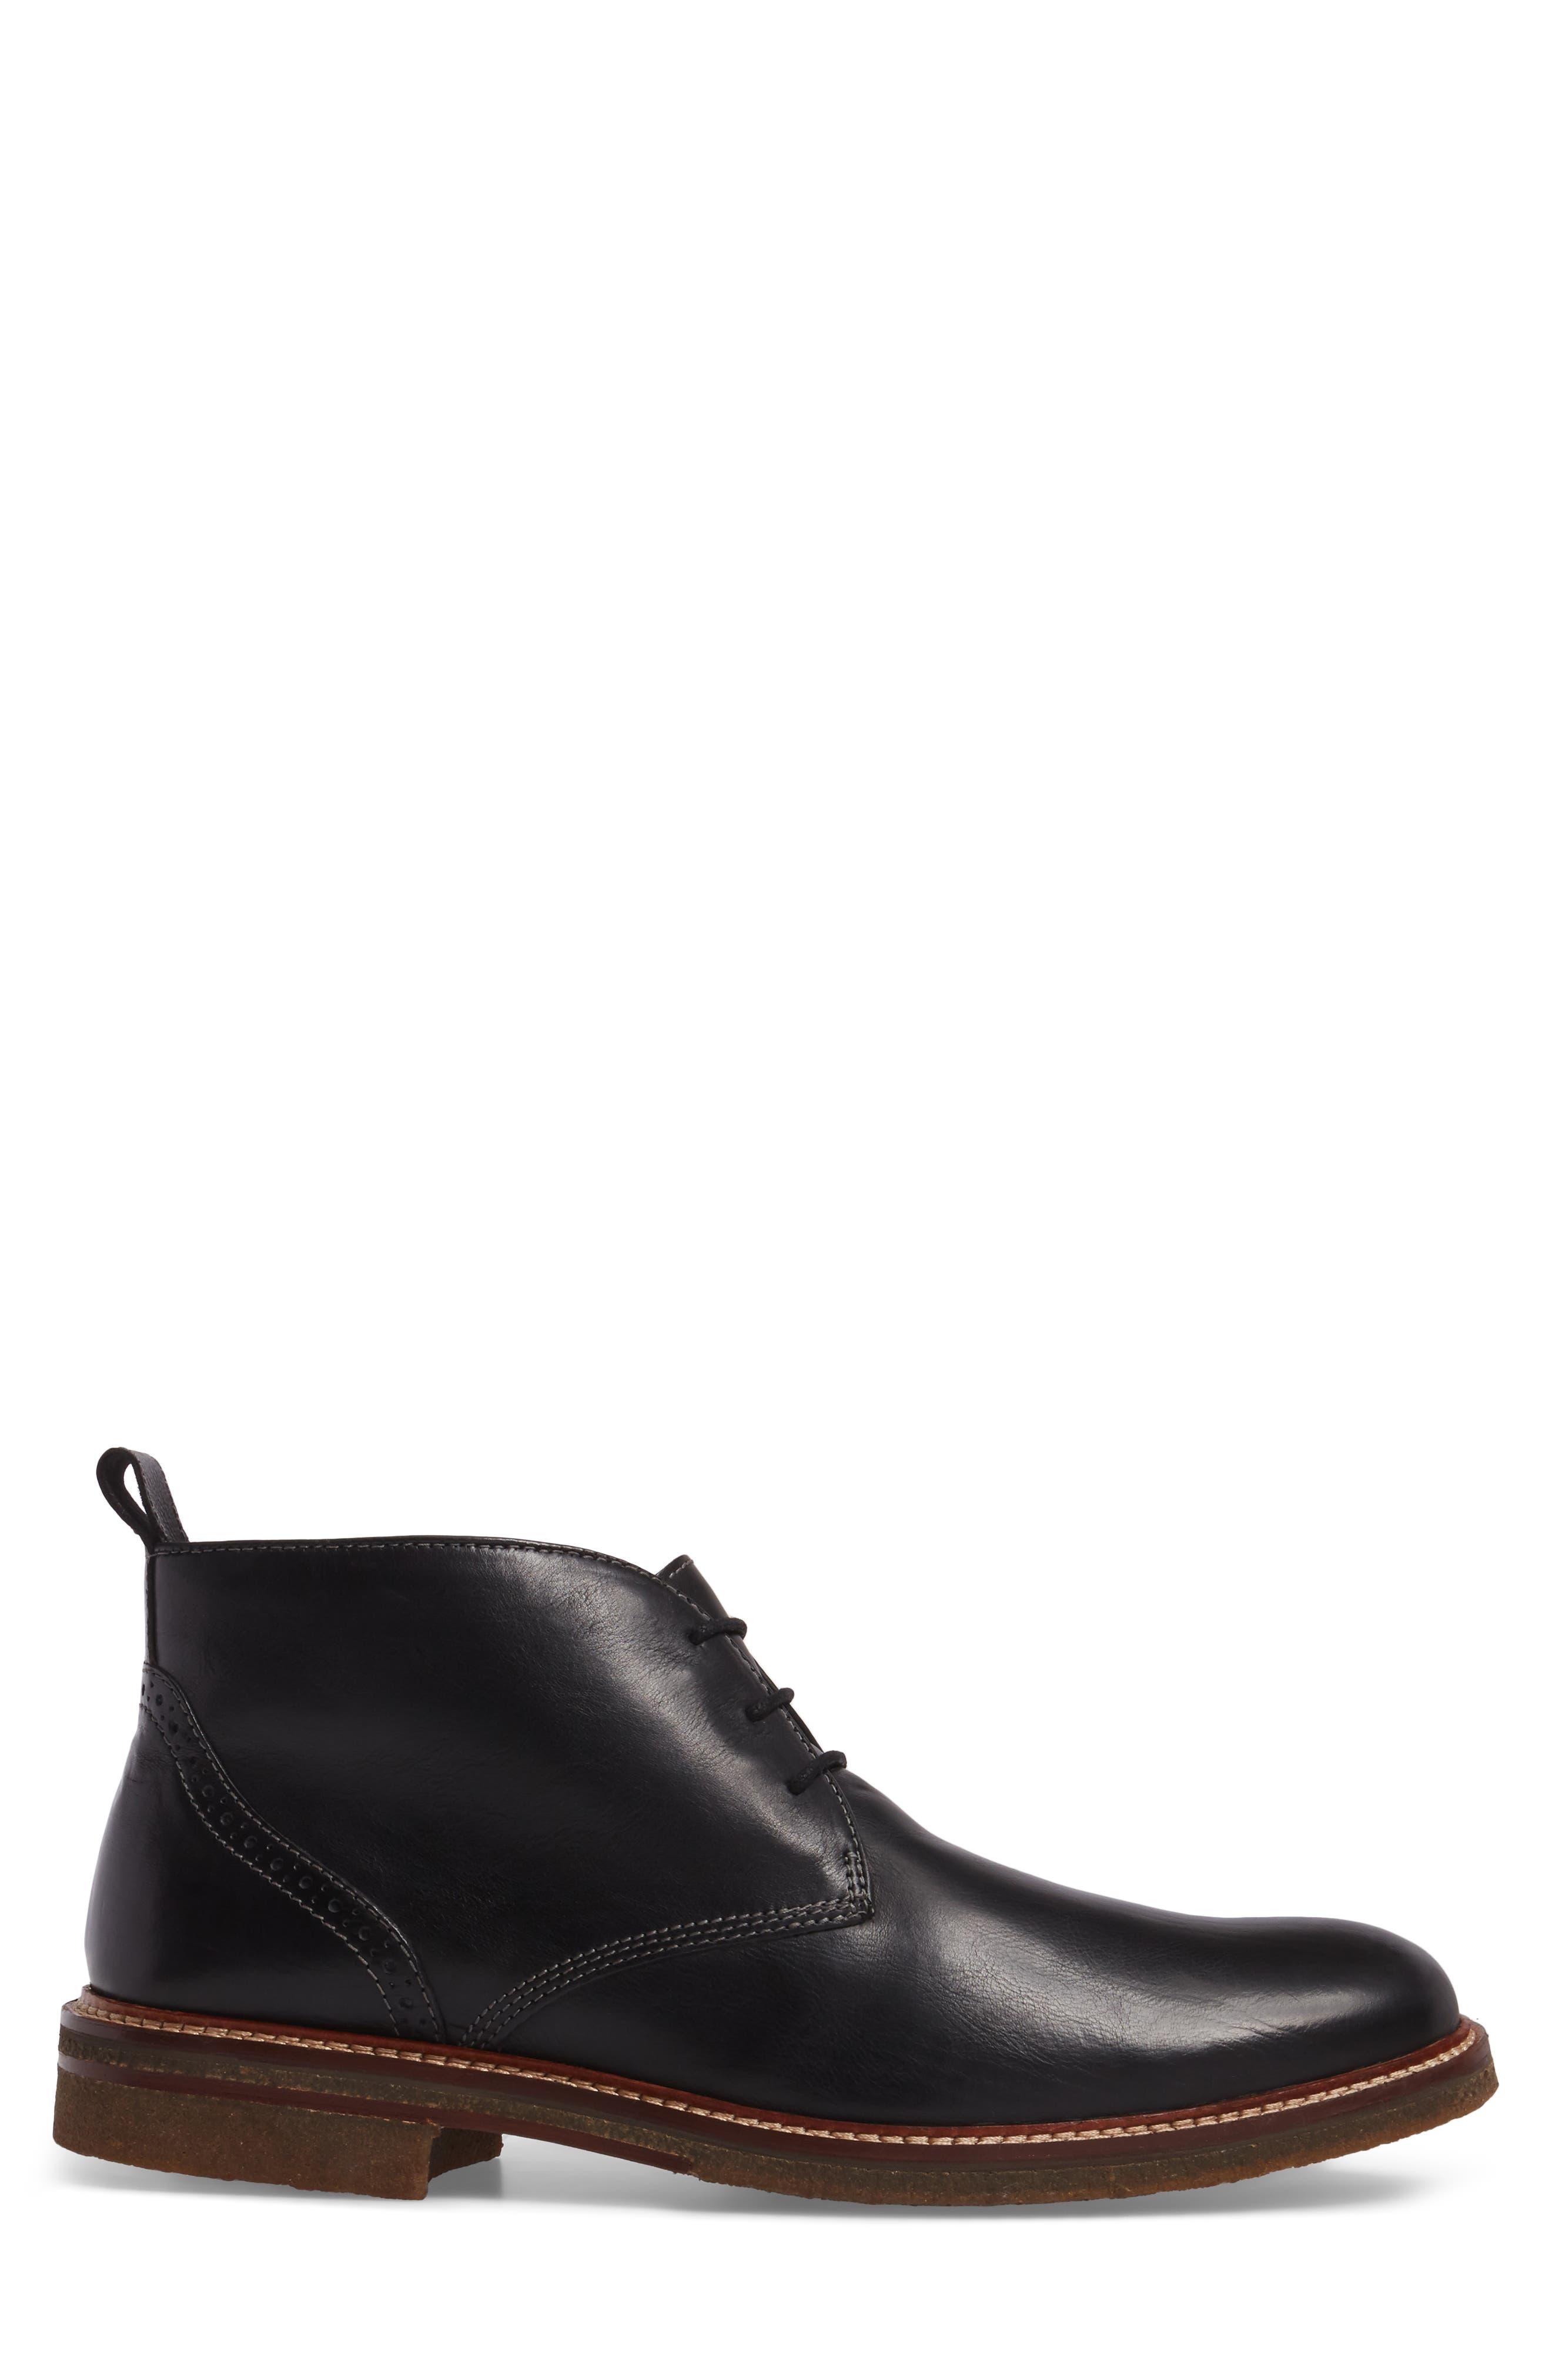 Forrester Chukka Boot,                             Alternate thumbnail 3, color,                             Black Leather